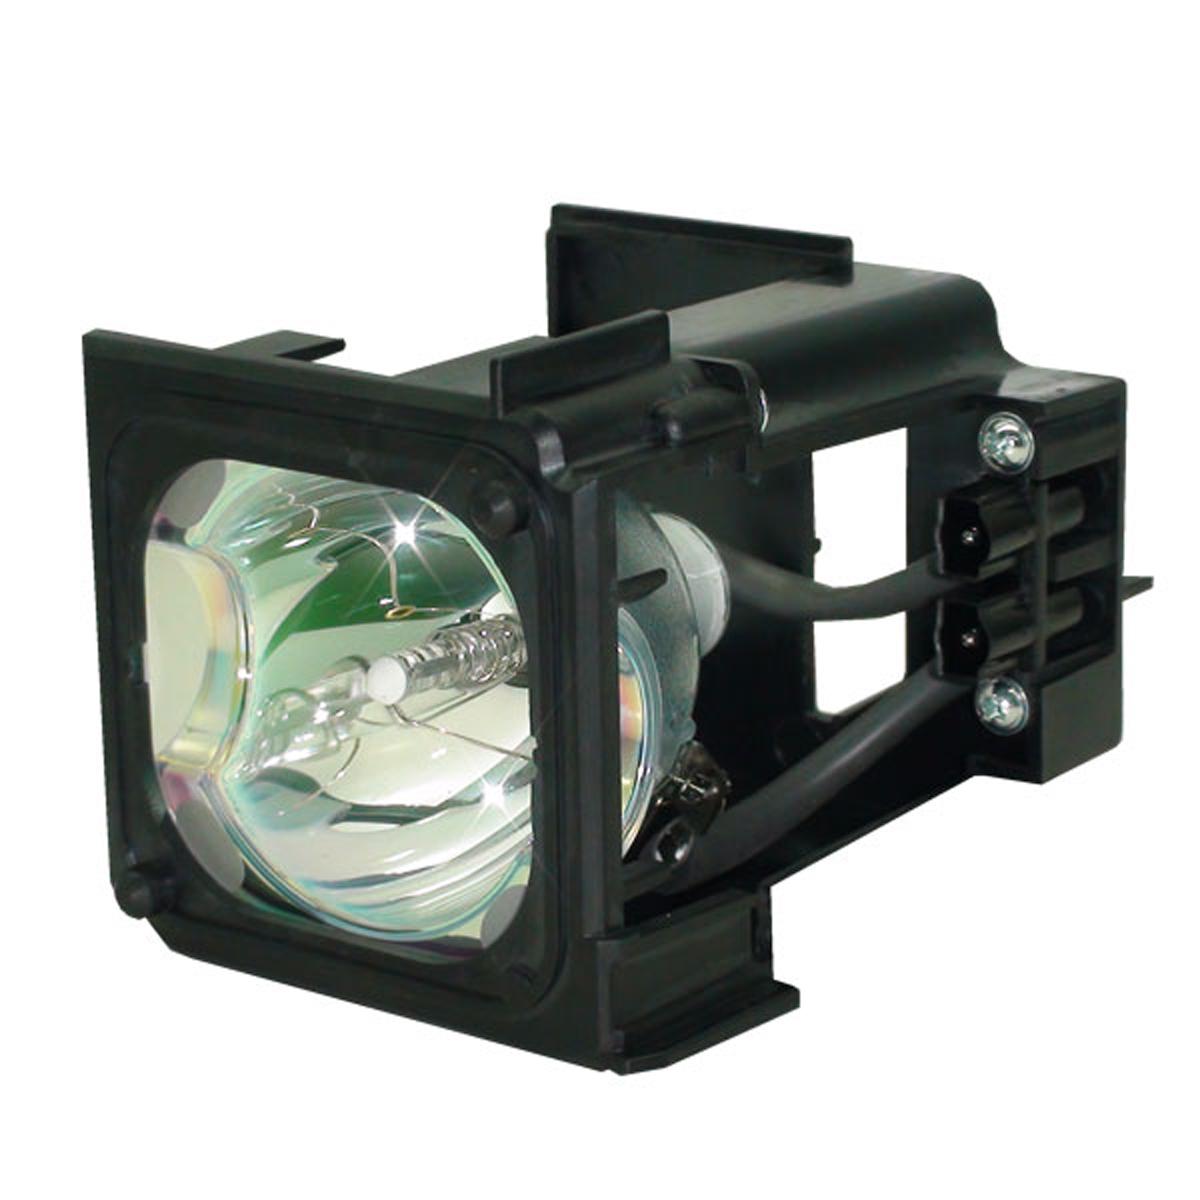 Samsung BP96-01795A TV Lamp